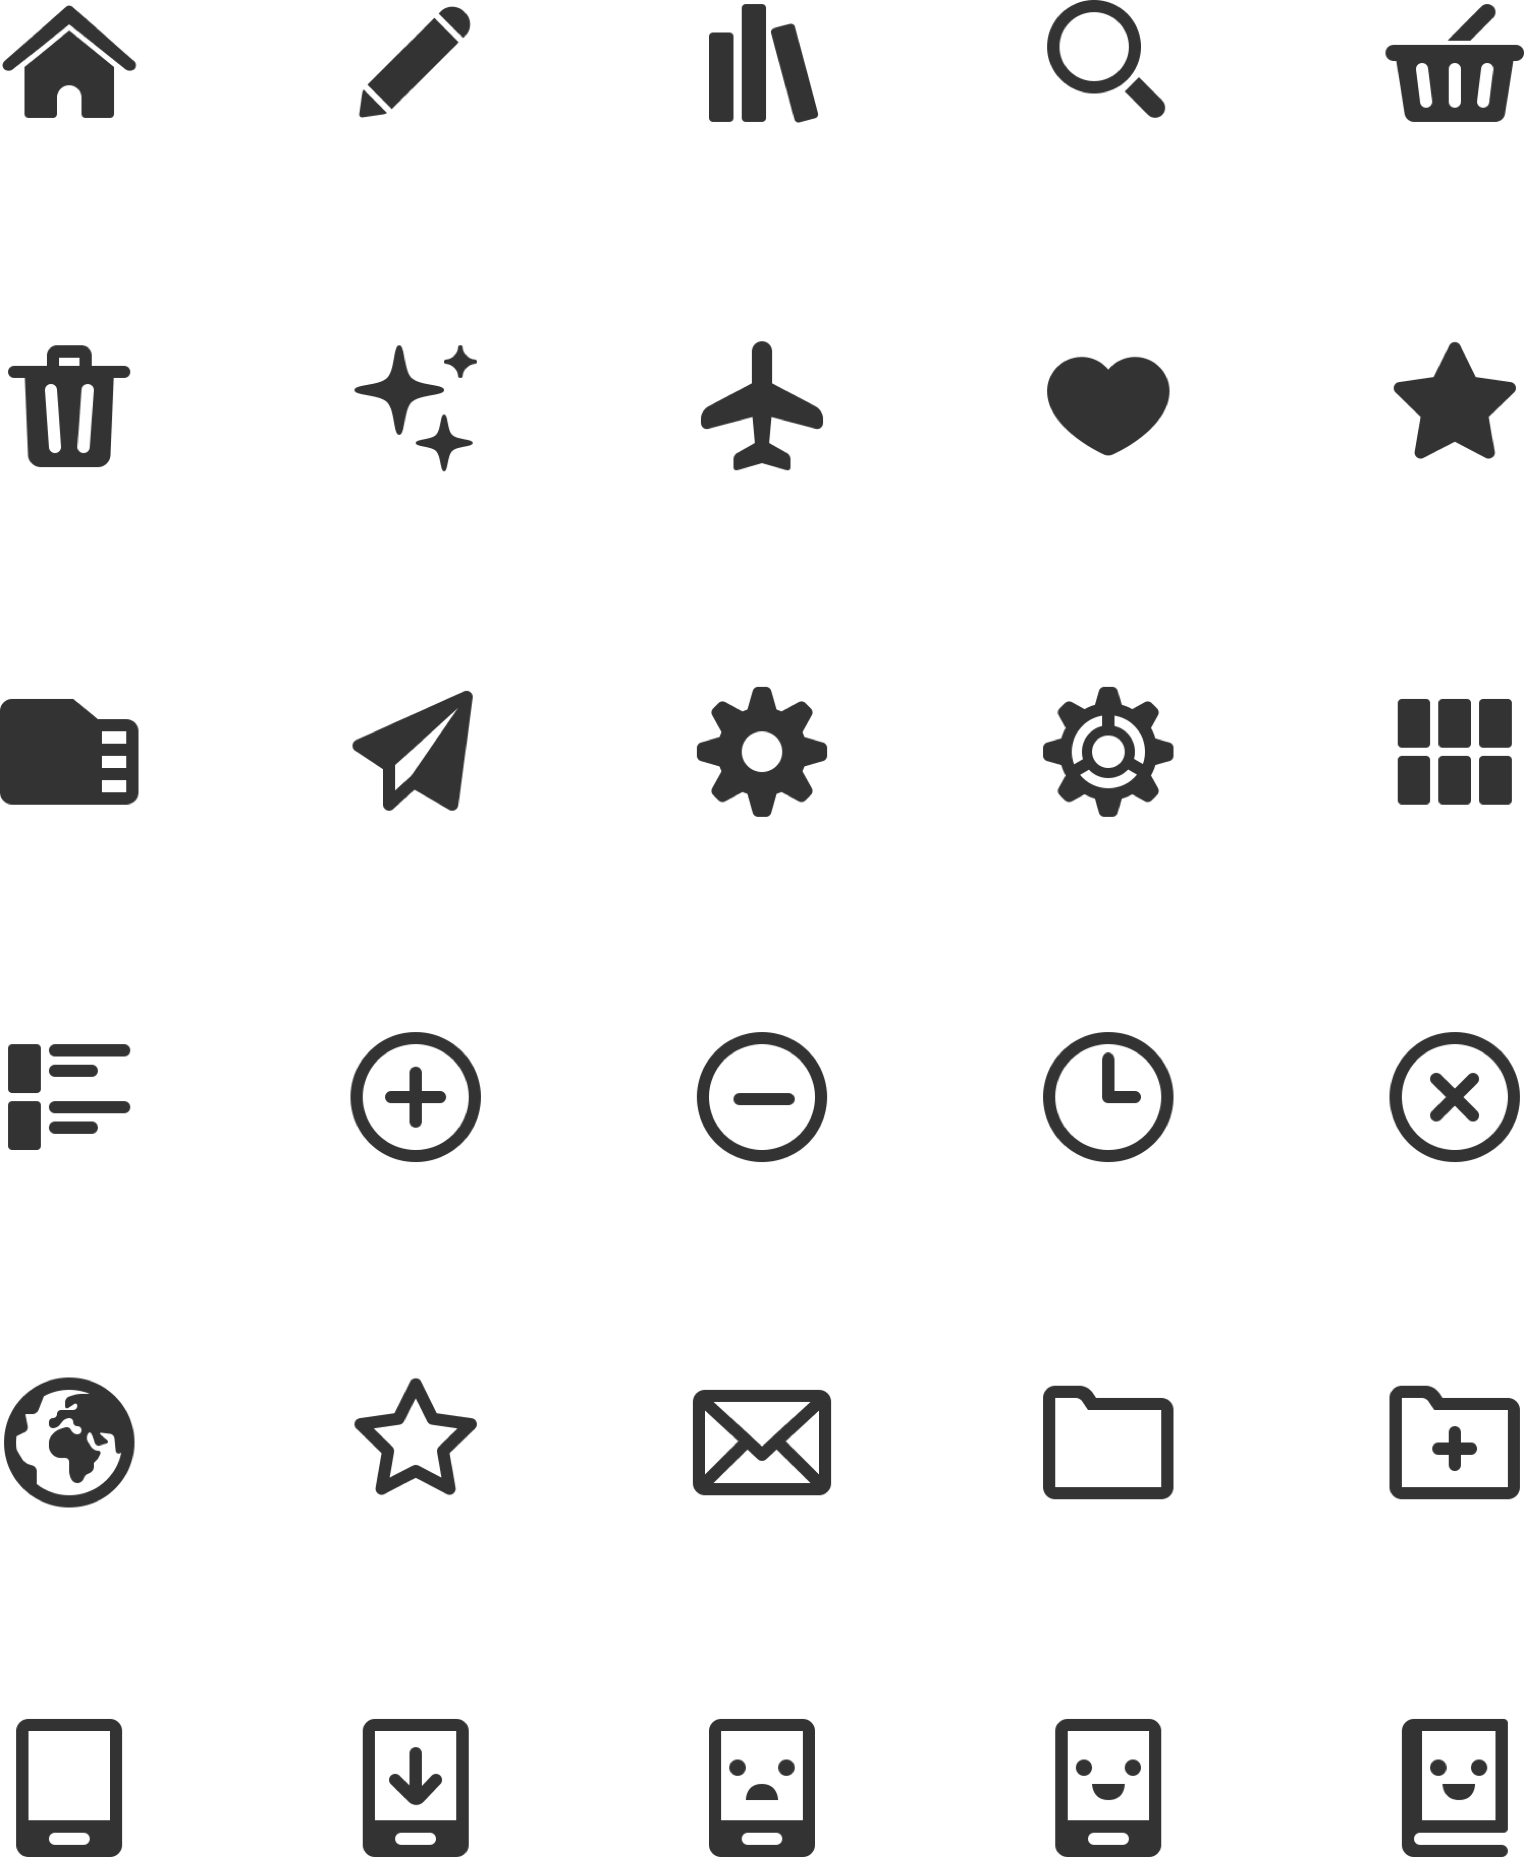 Icons for Dibug Saga e-reader